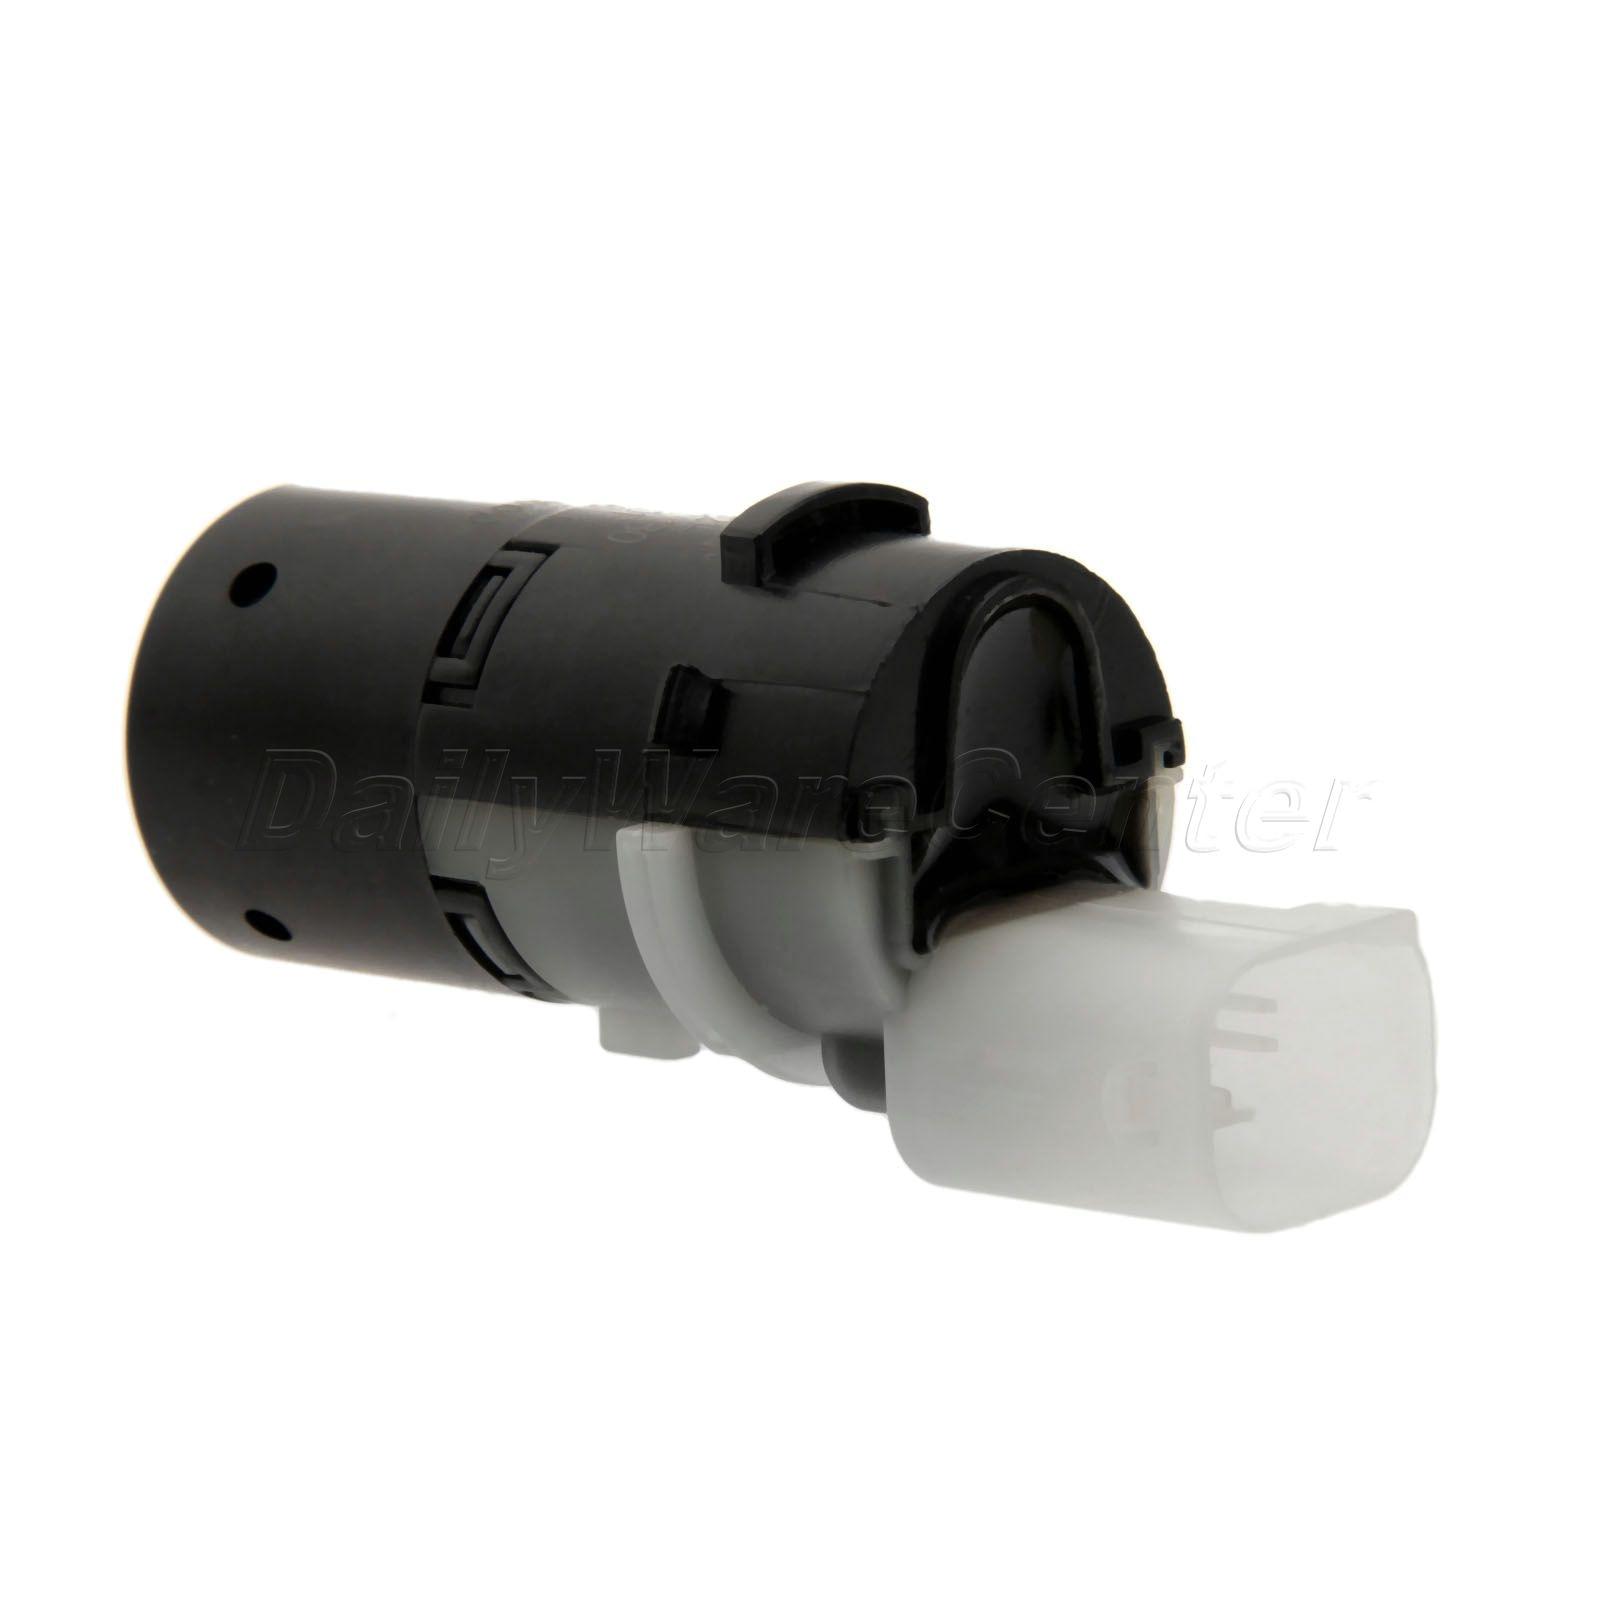 Nuevo 1 Pc Pdc Aparcamiento Trasero Inversa Sensor 66216902180 Para Bmw Serie 3 E46 M3 330 330xd 320